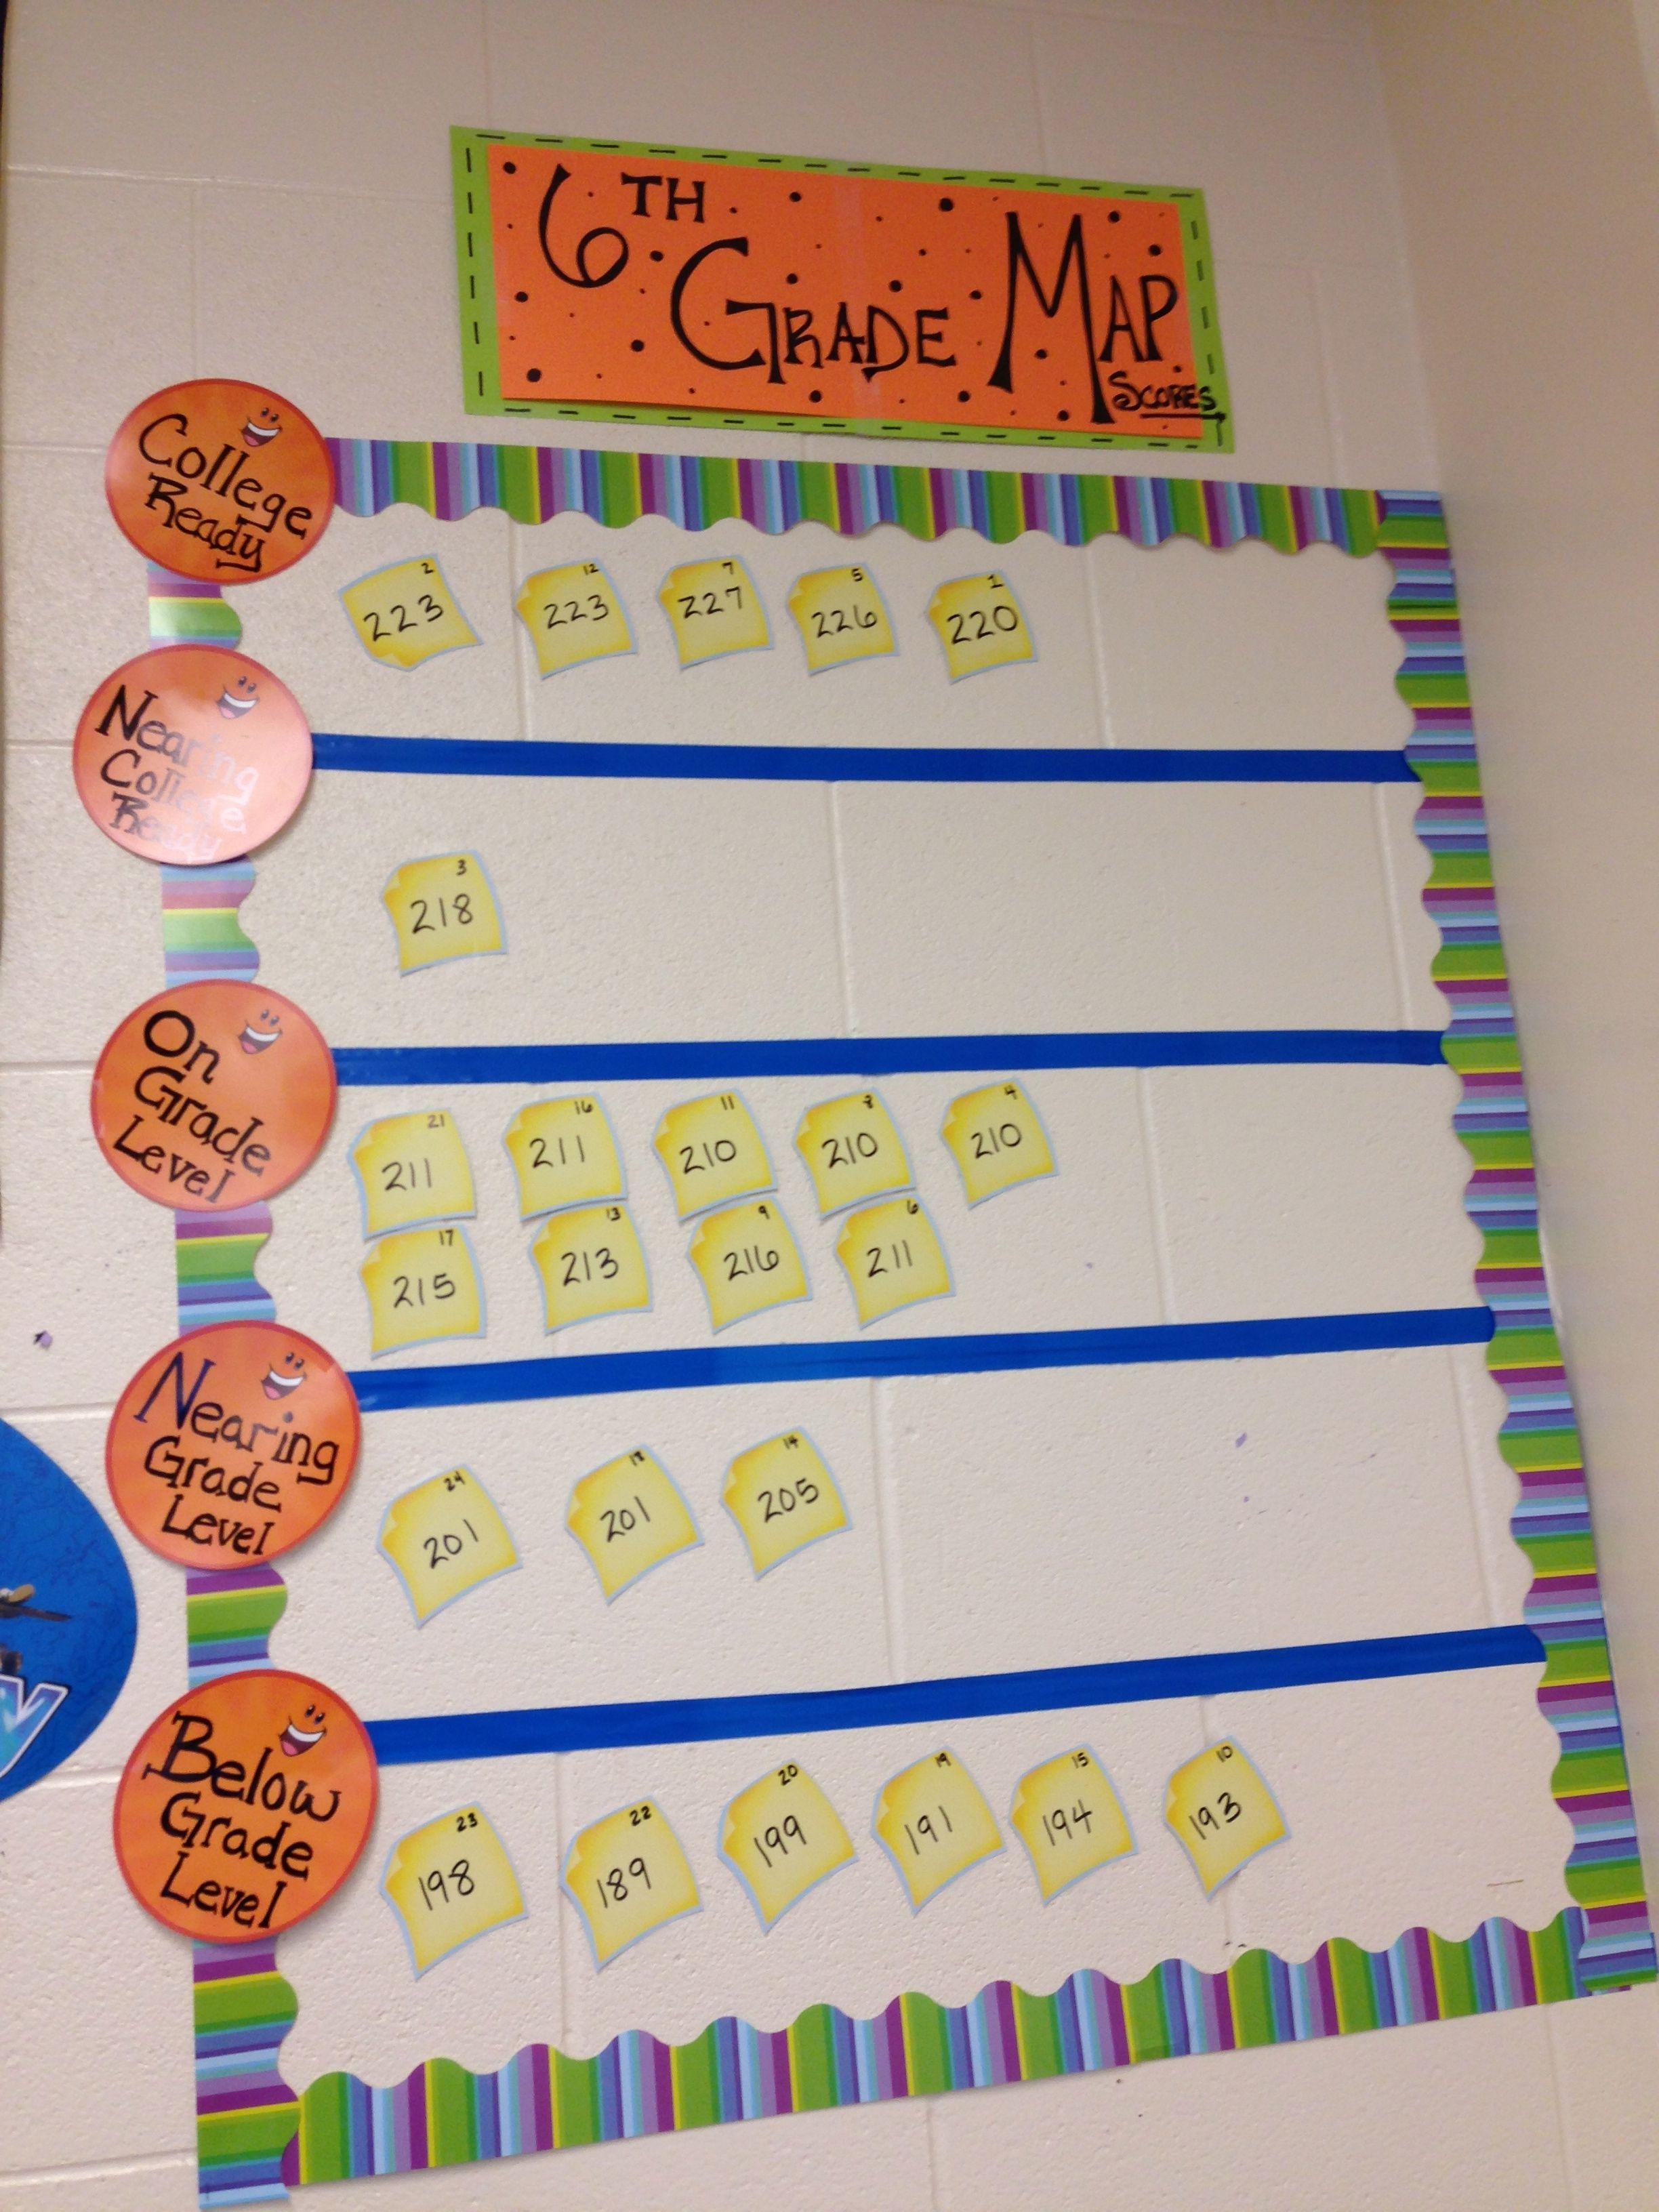 Nwea Scores Nwea Testing Motivation School Organization Map reading scores grade